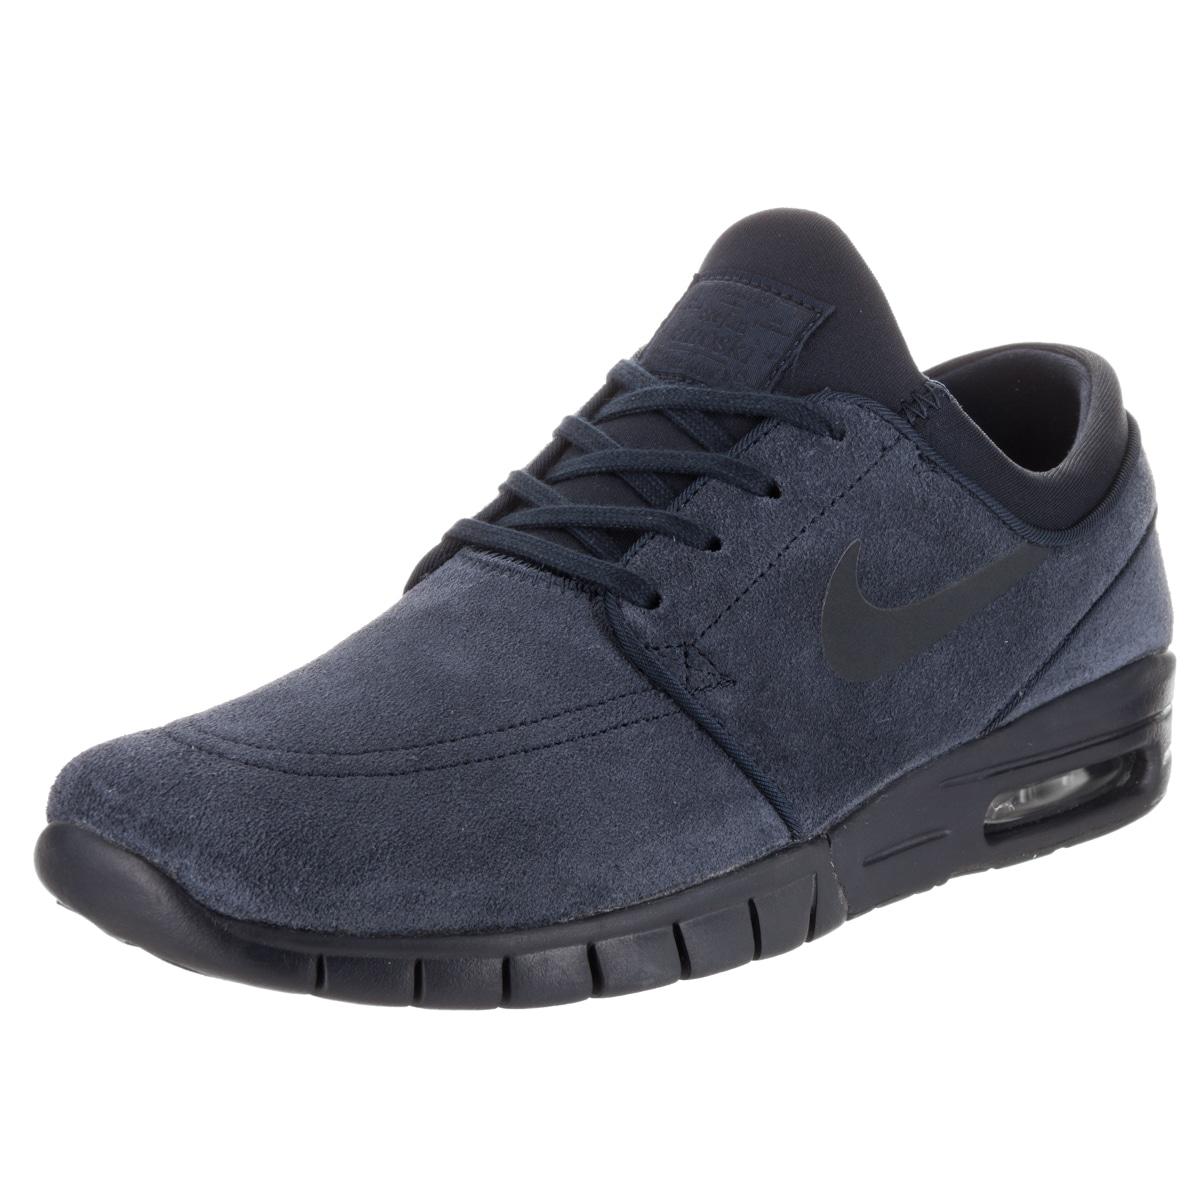 san francisco b4b85 13f62 Nike -Mens-Stefan-Janoski-Max-L-Skate-Shoe-32c29e43-3b31-4f1e-b1c5-54a09b927b53.jpg